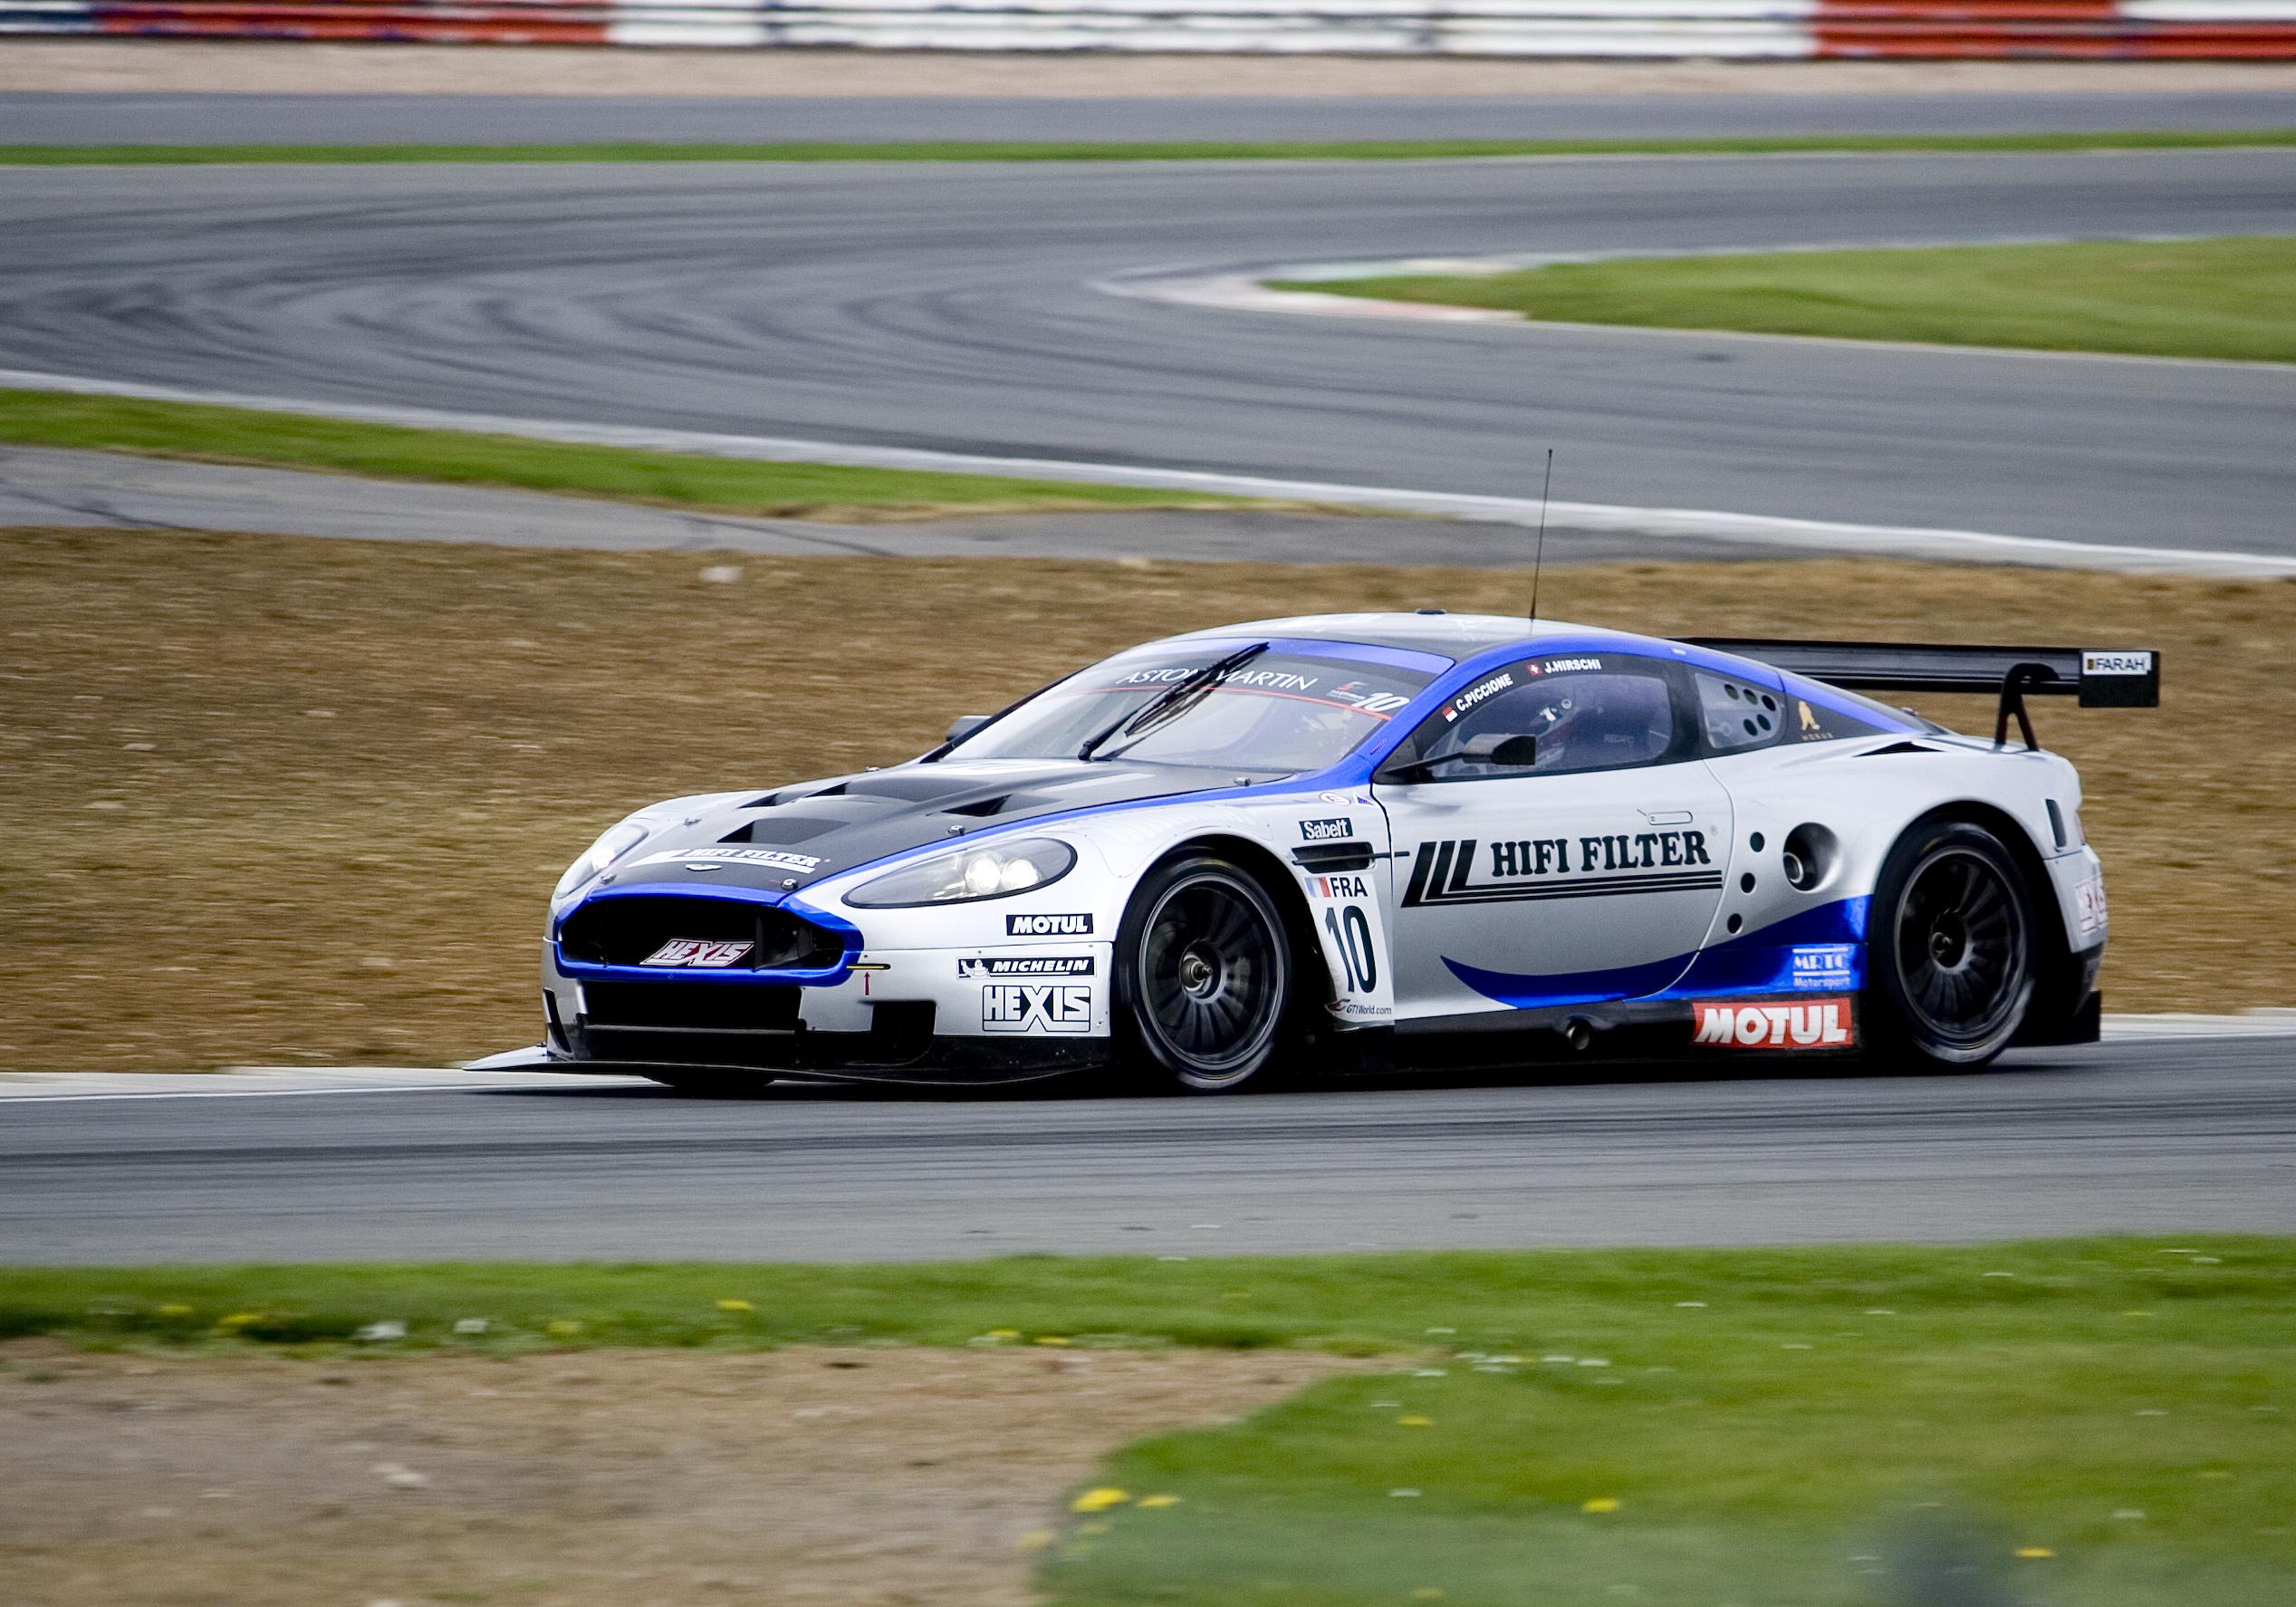 FIA GT1世界選手権